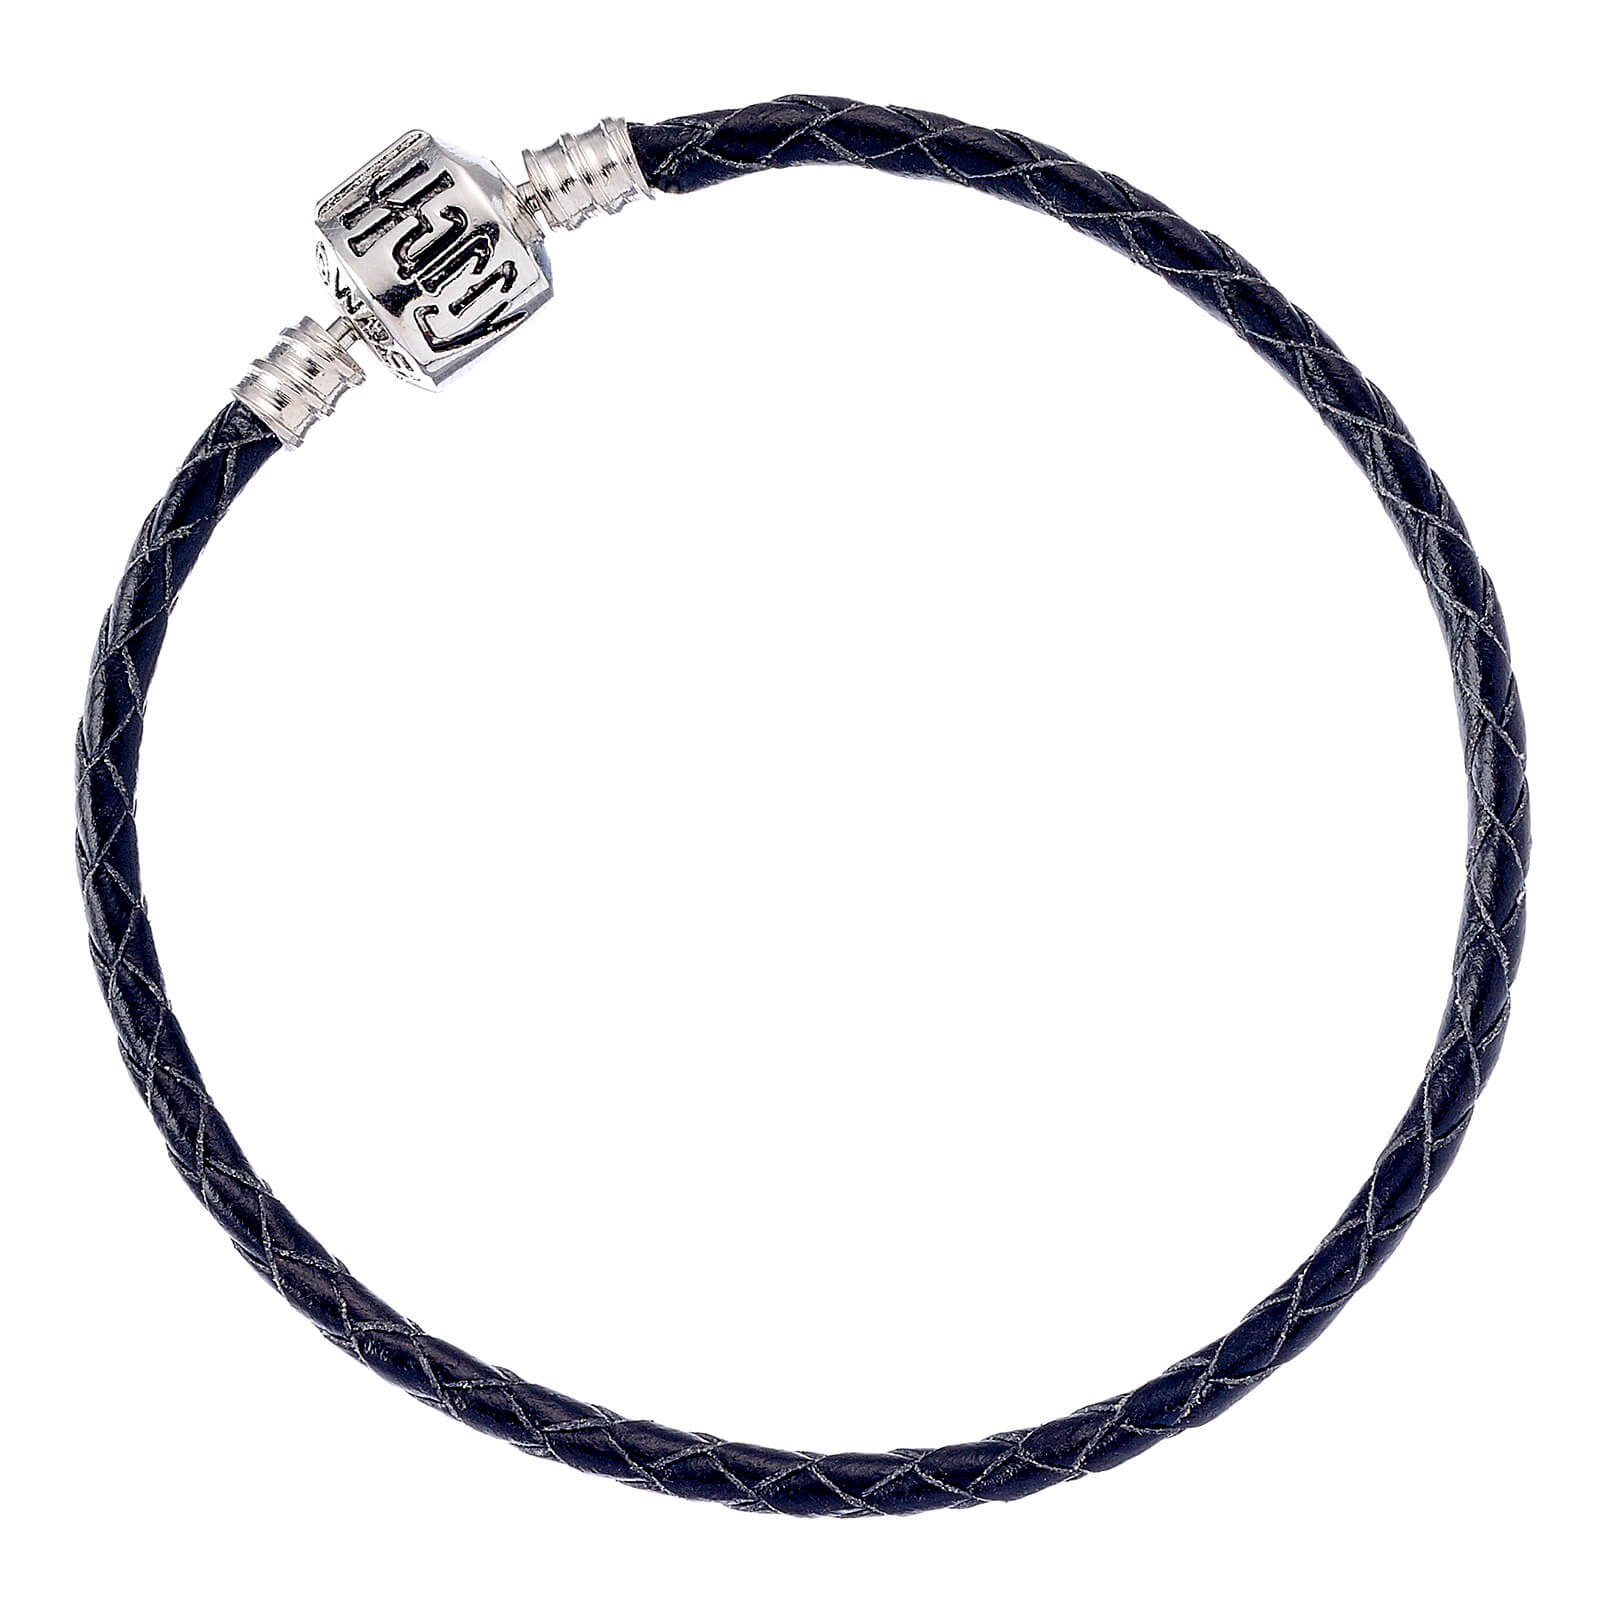 Harry Potter Black Leather Charm Bracelet (Various Sizes) - 18cm